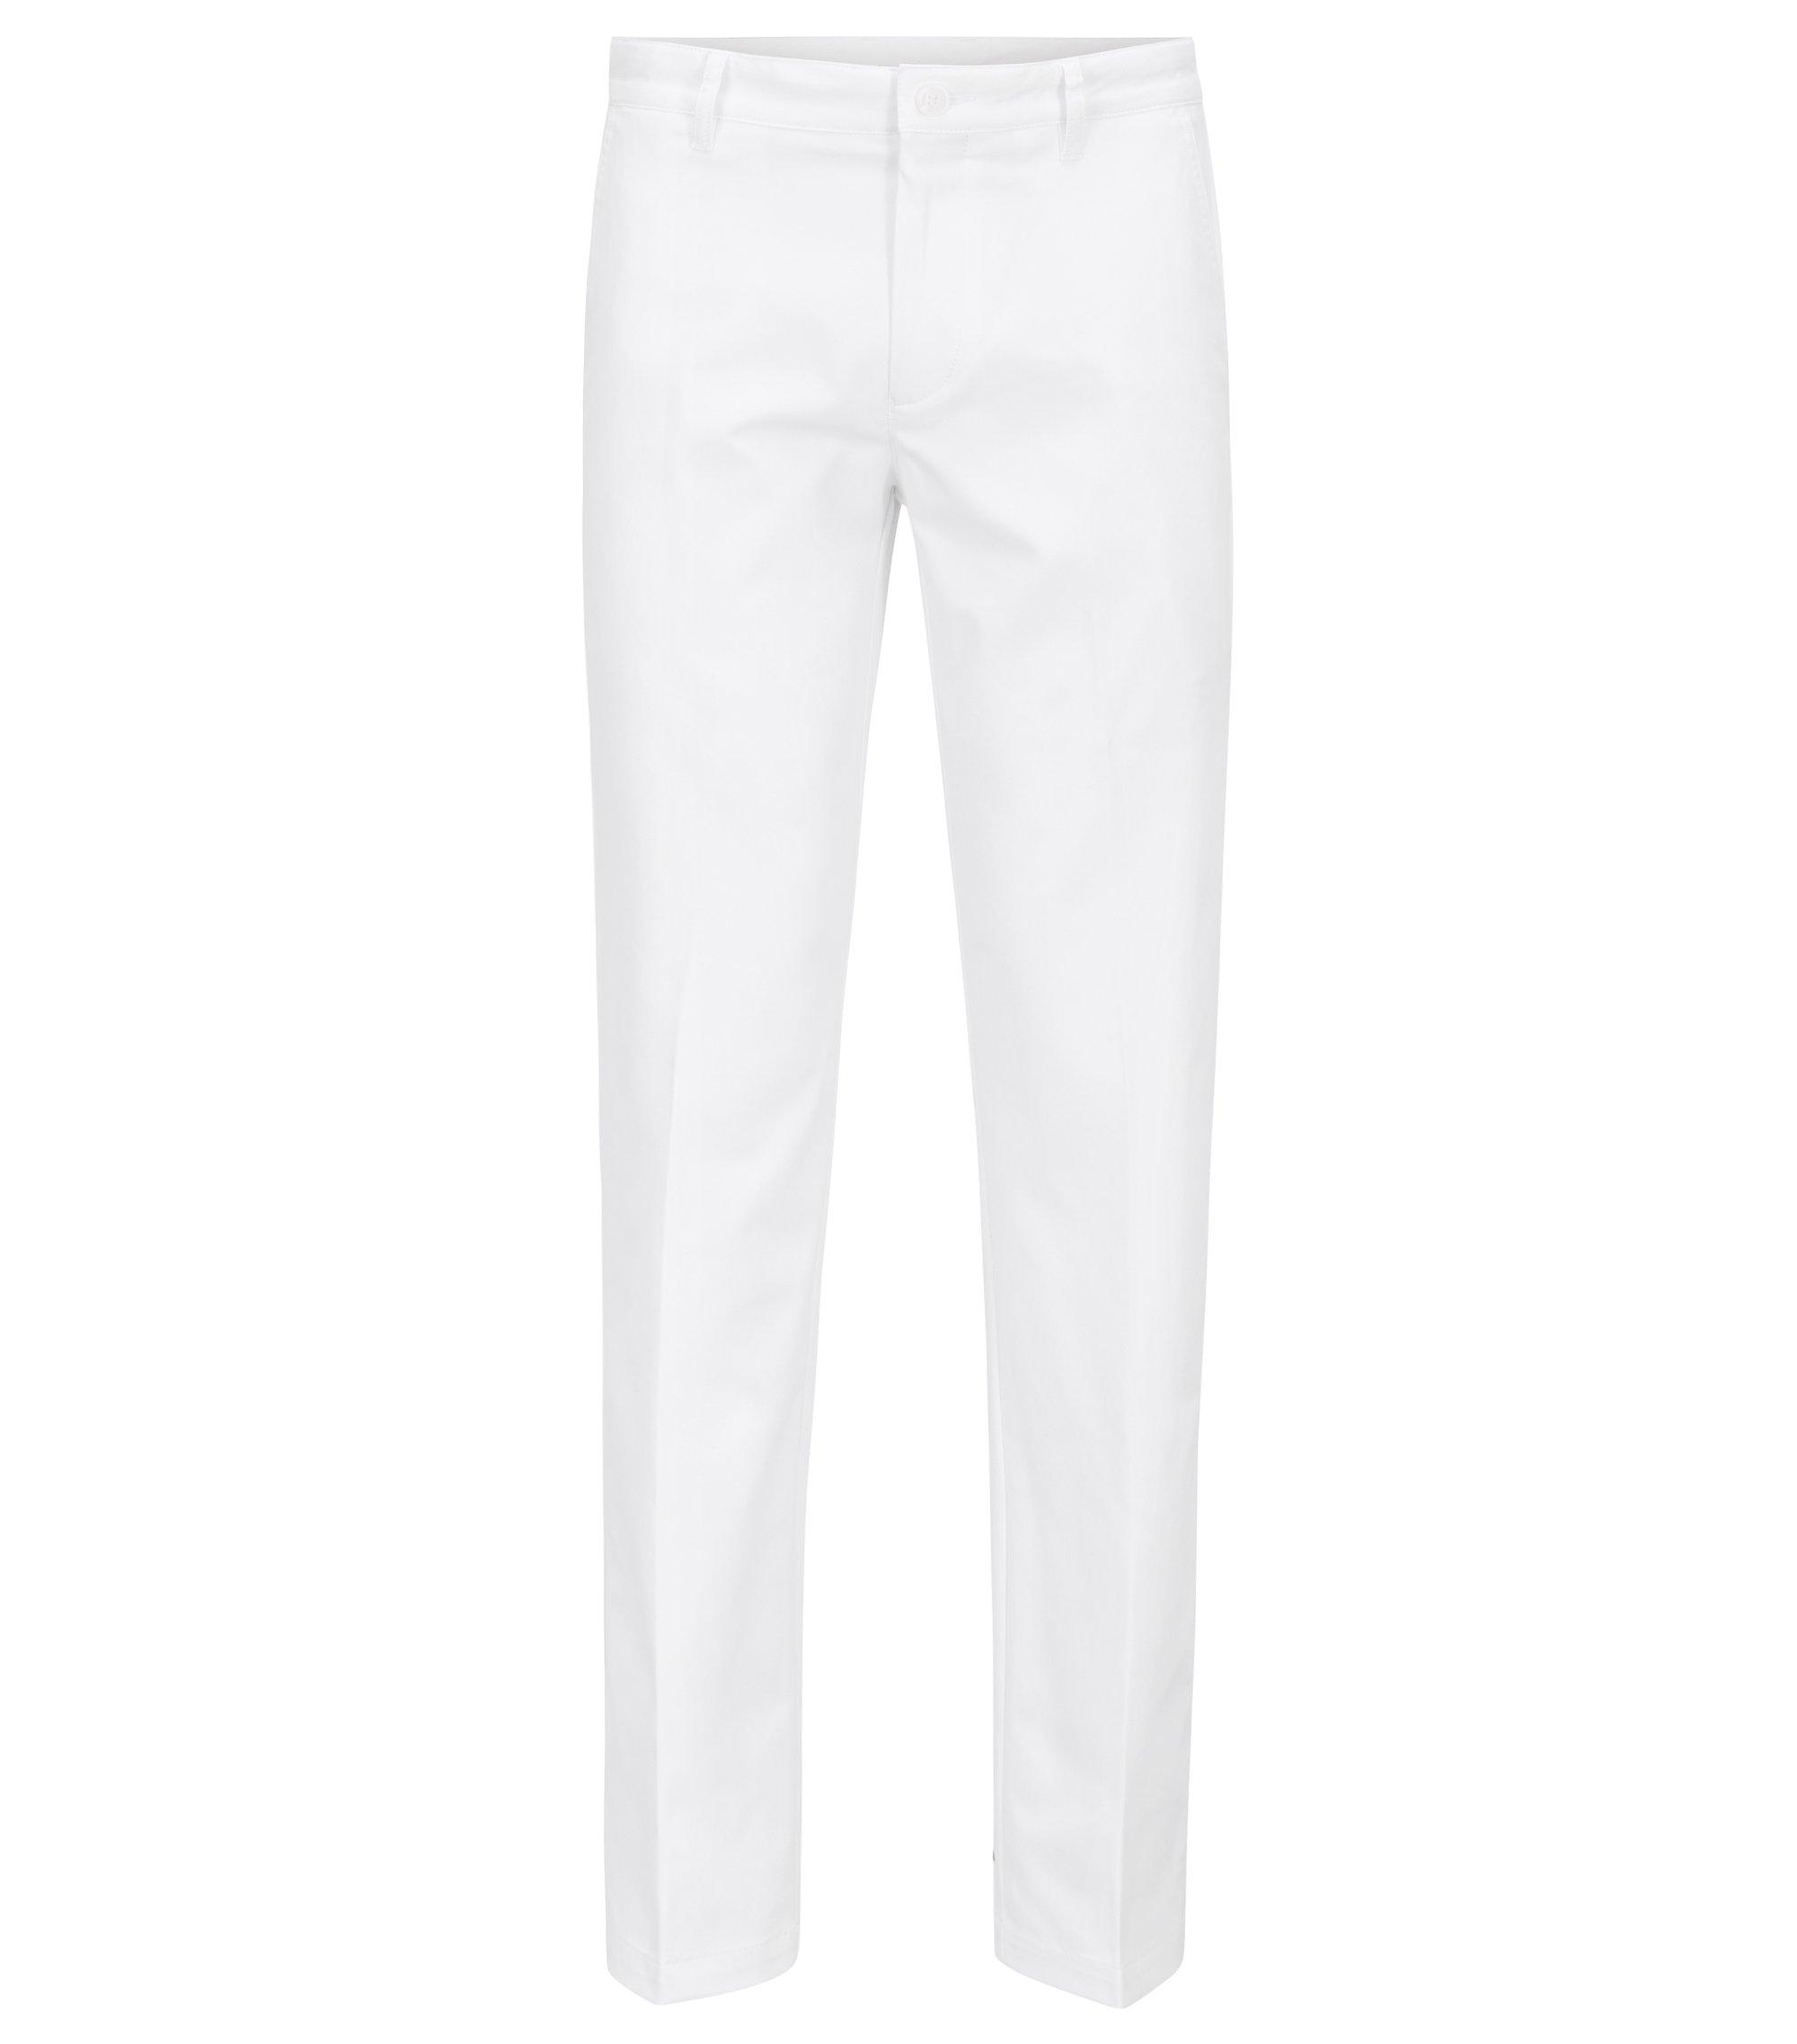 CoolMax Performance Golf Pant, Slim Fit | Hakan , White